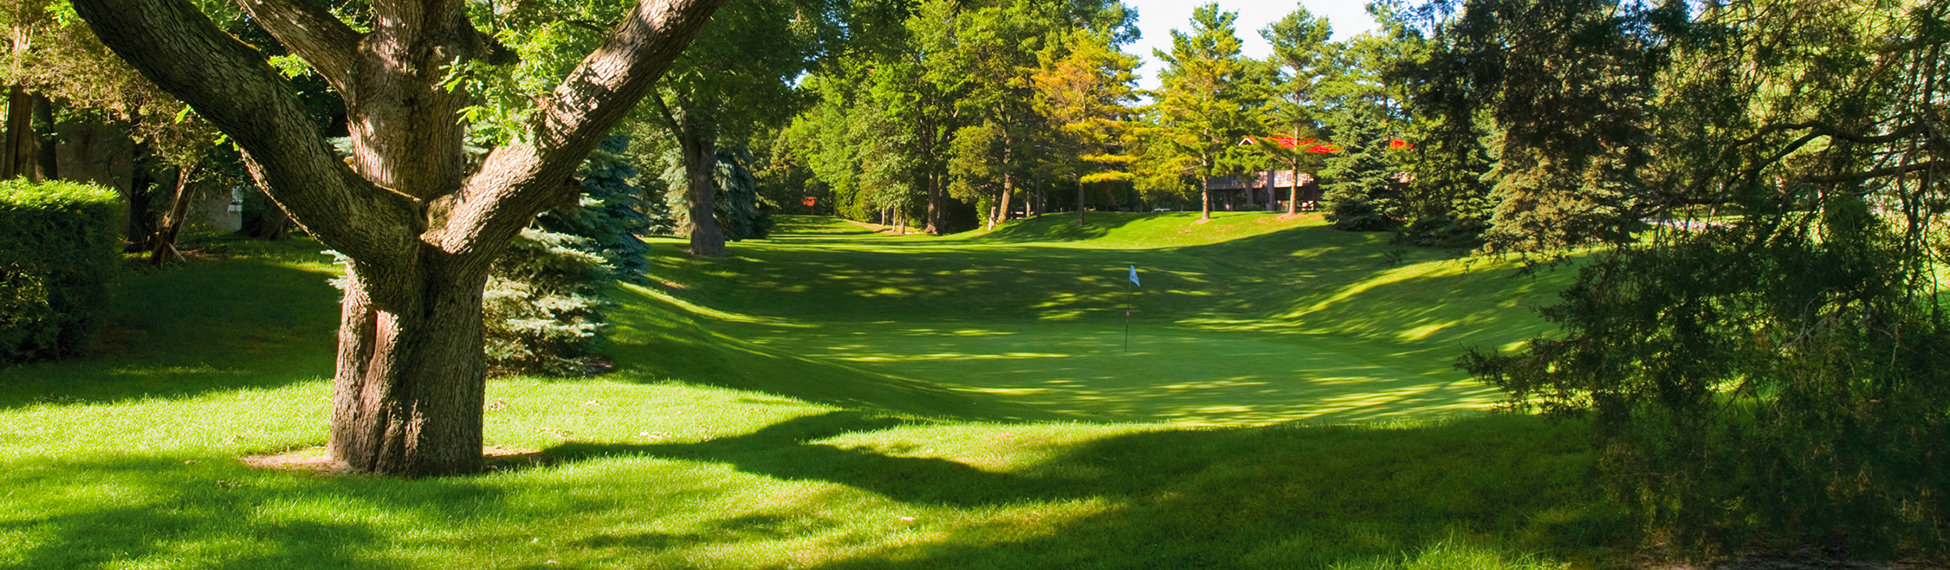 Golf Fall Getaway